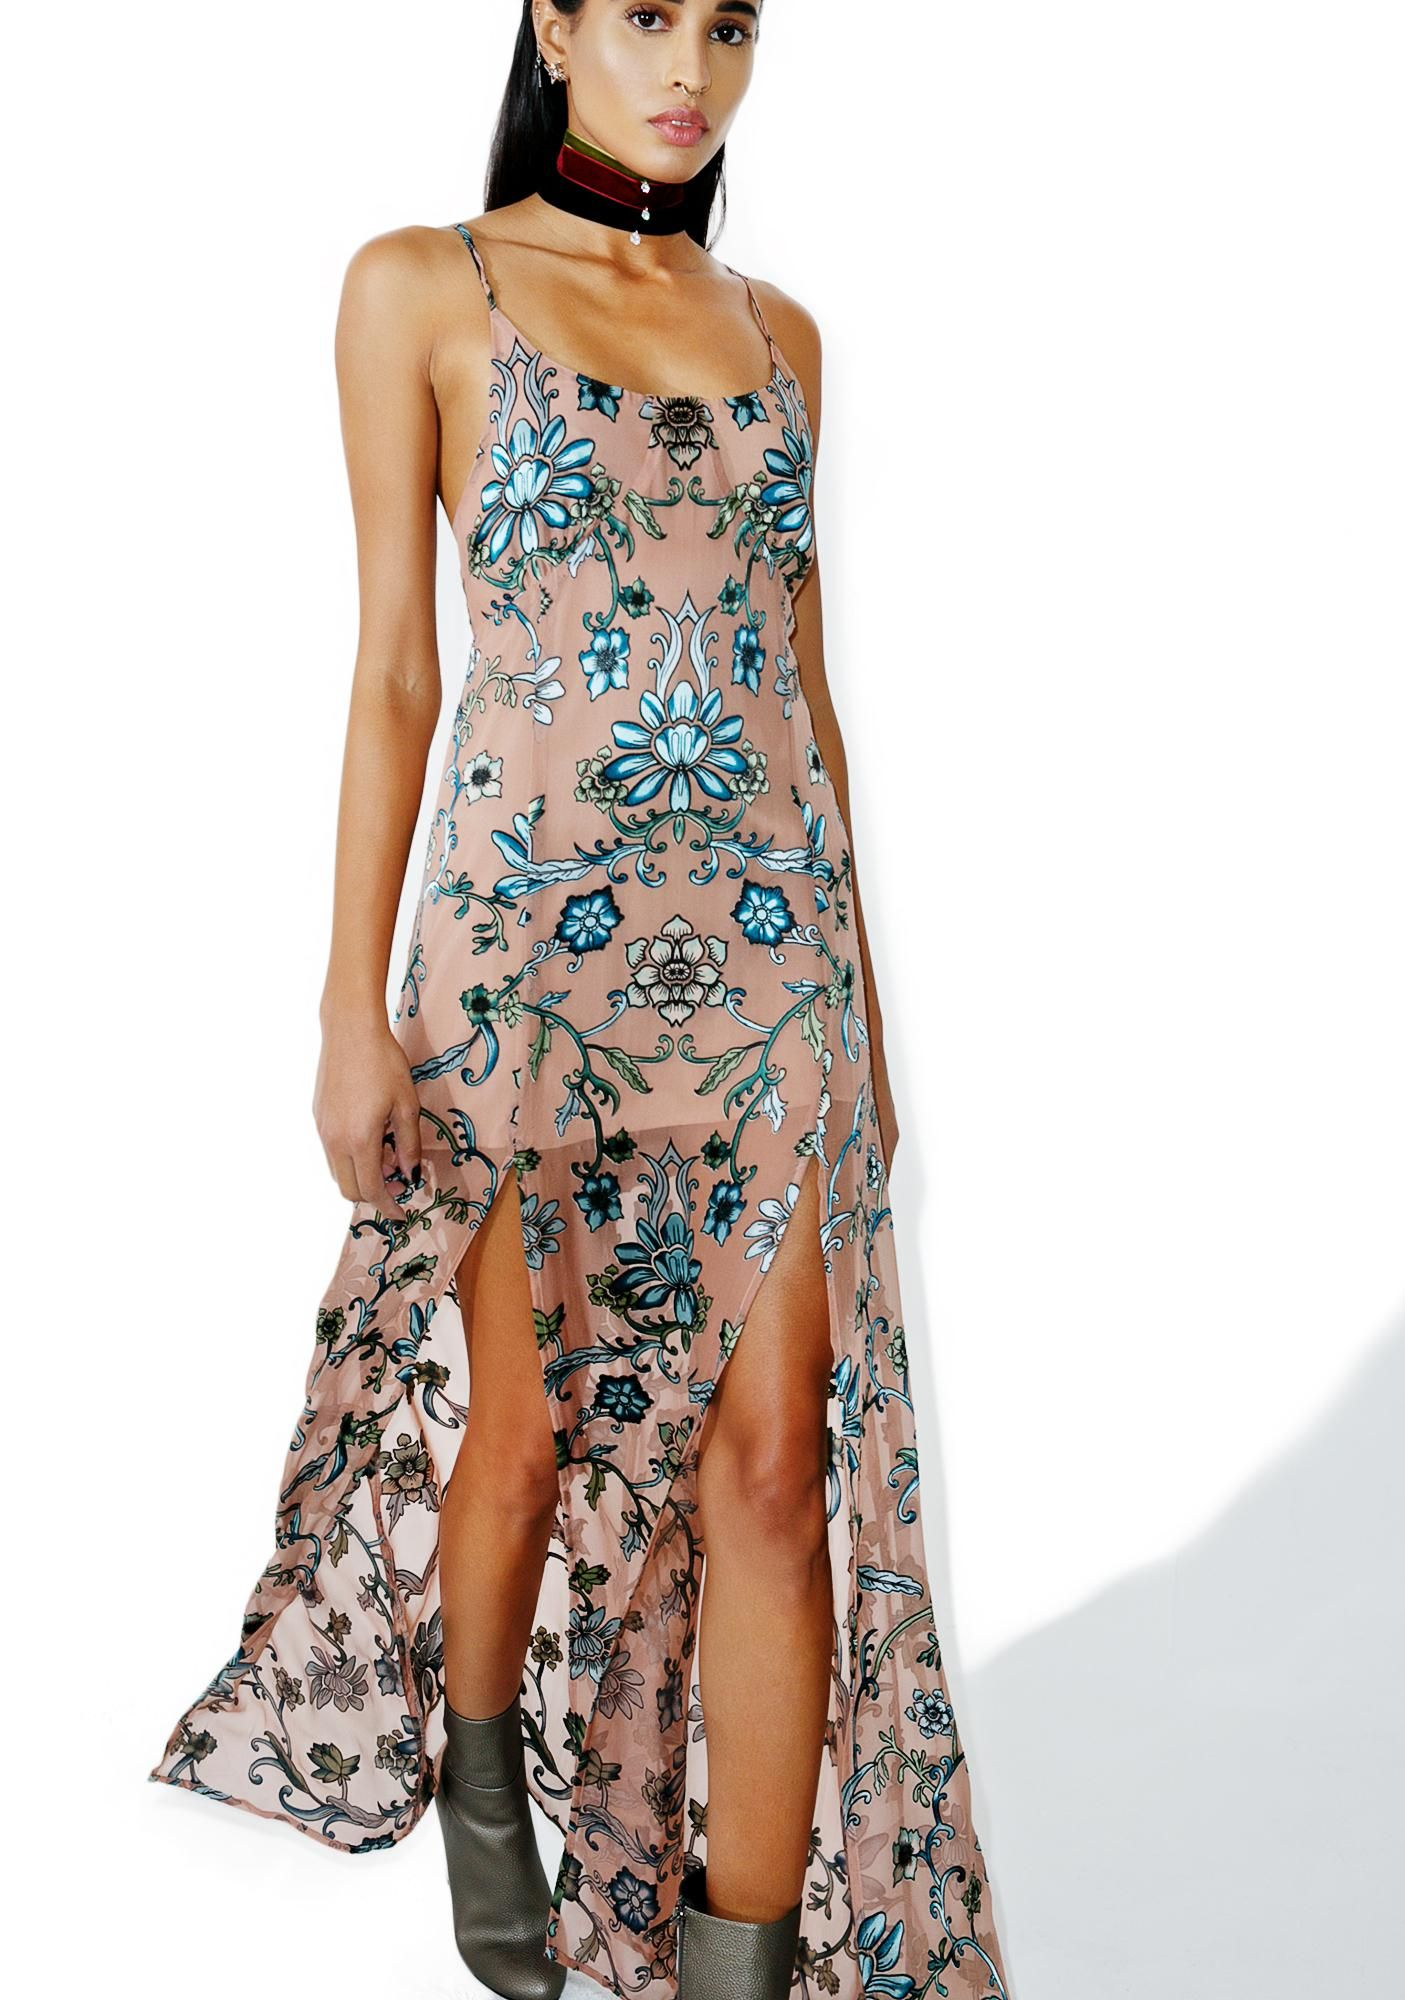 For love u lemons saffron sleeveless maxi dress is gunna entice uem